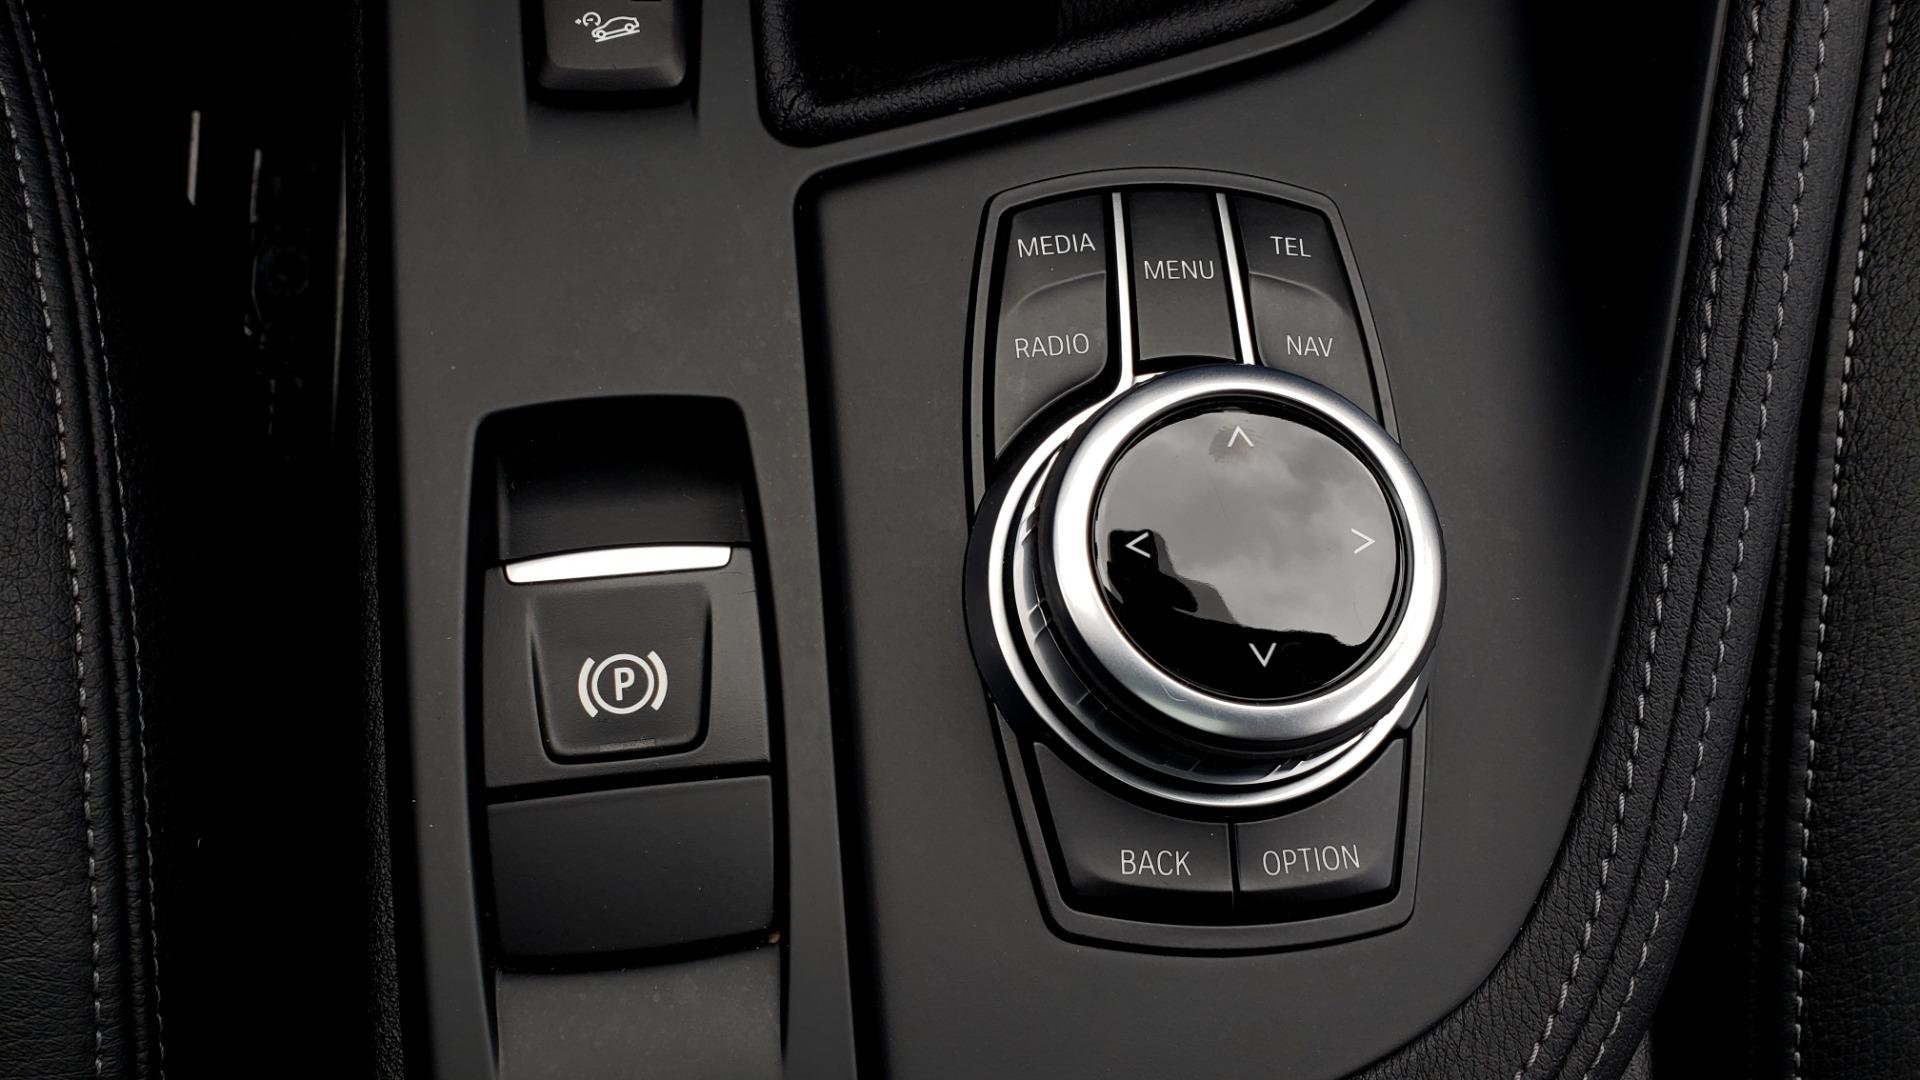 Used 2017 BMW X1 XDRIVE28I / PREM PKG / DRIVER ASST / NAV / CLD WTHR for sale Sold at Formula Imports in Charlotte NC 28227 53